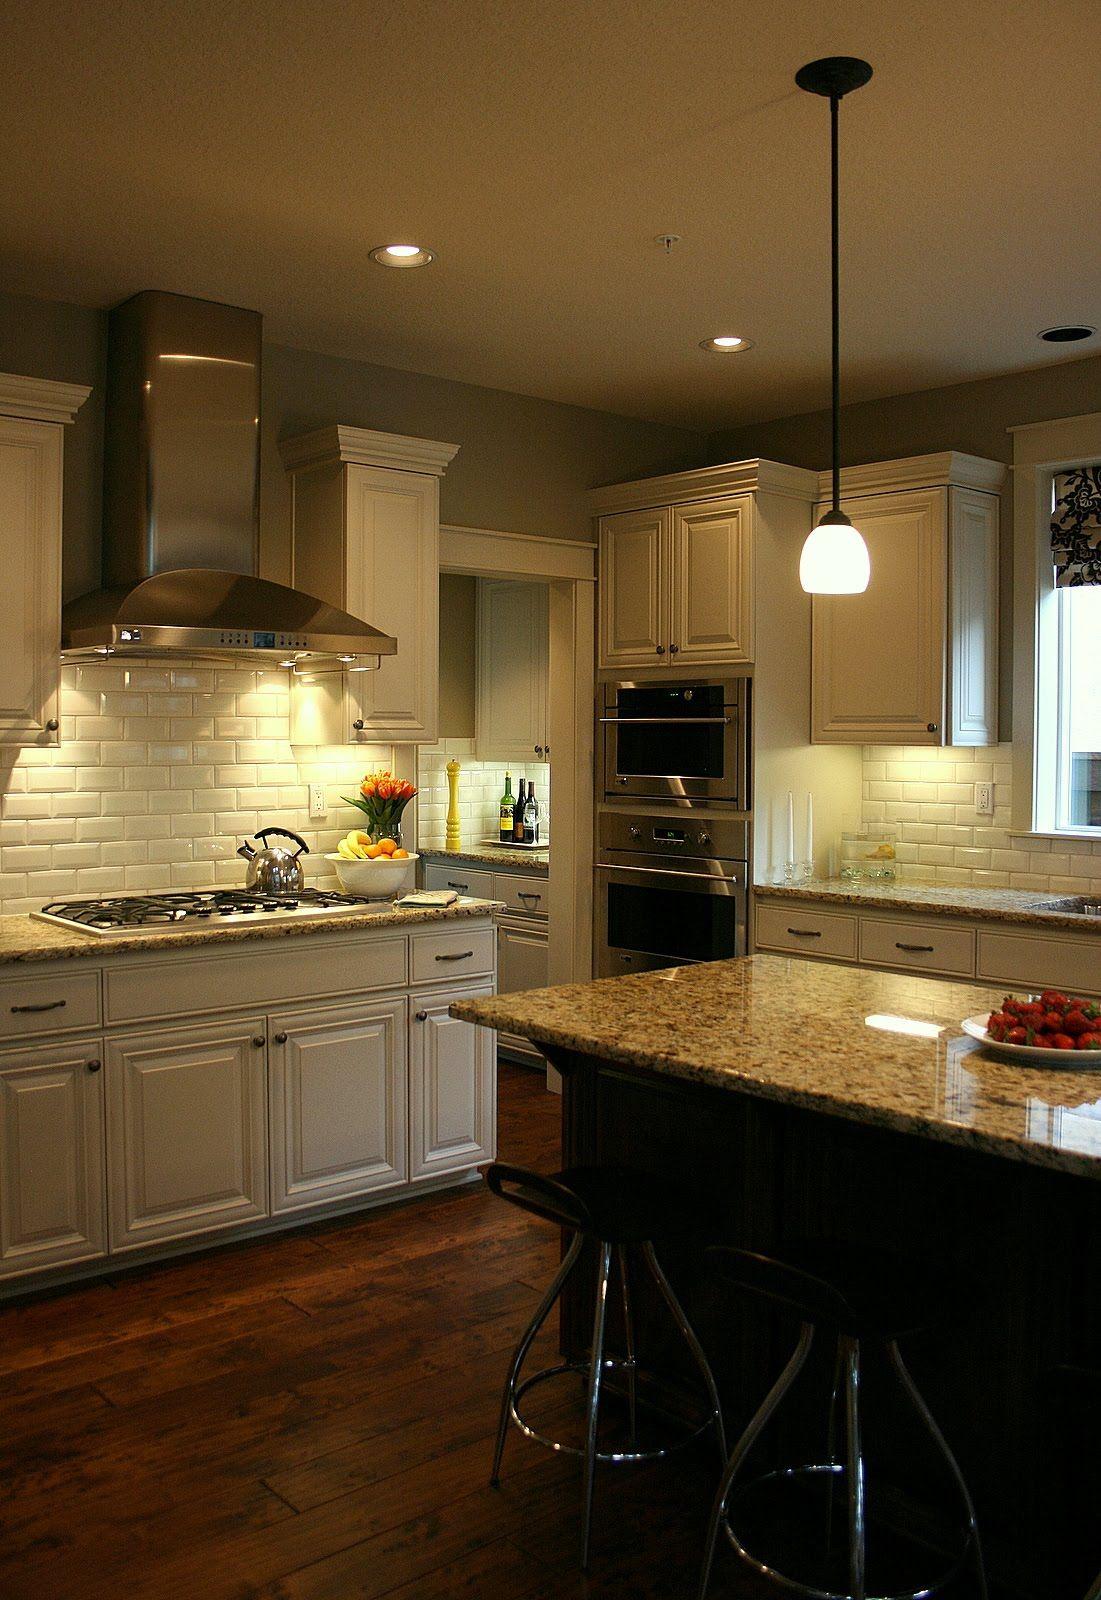 dream kitchen minus the countertops already have